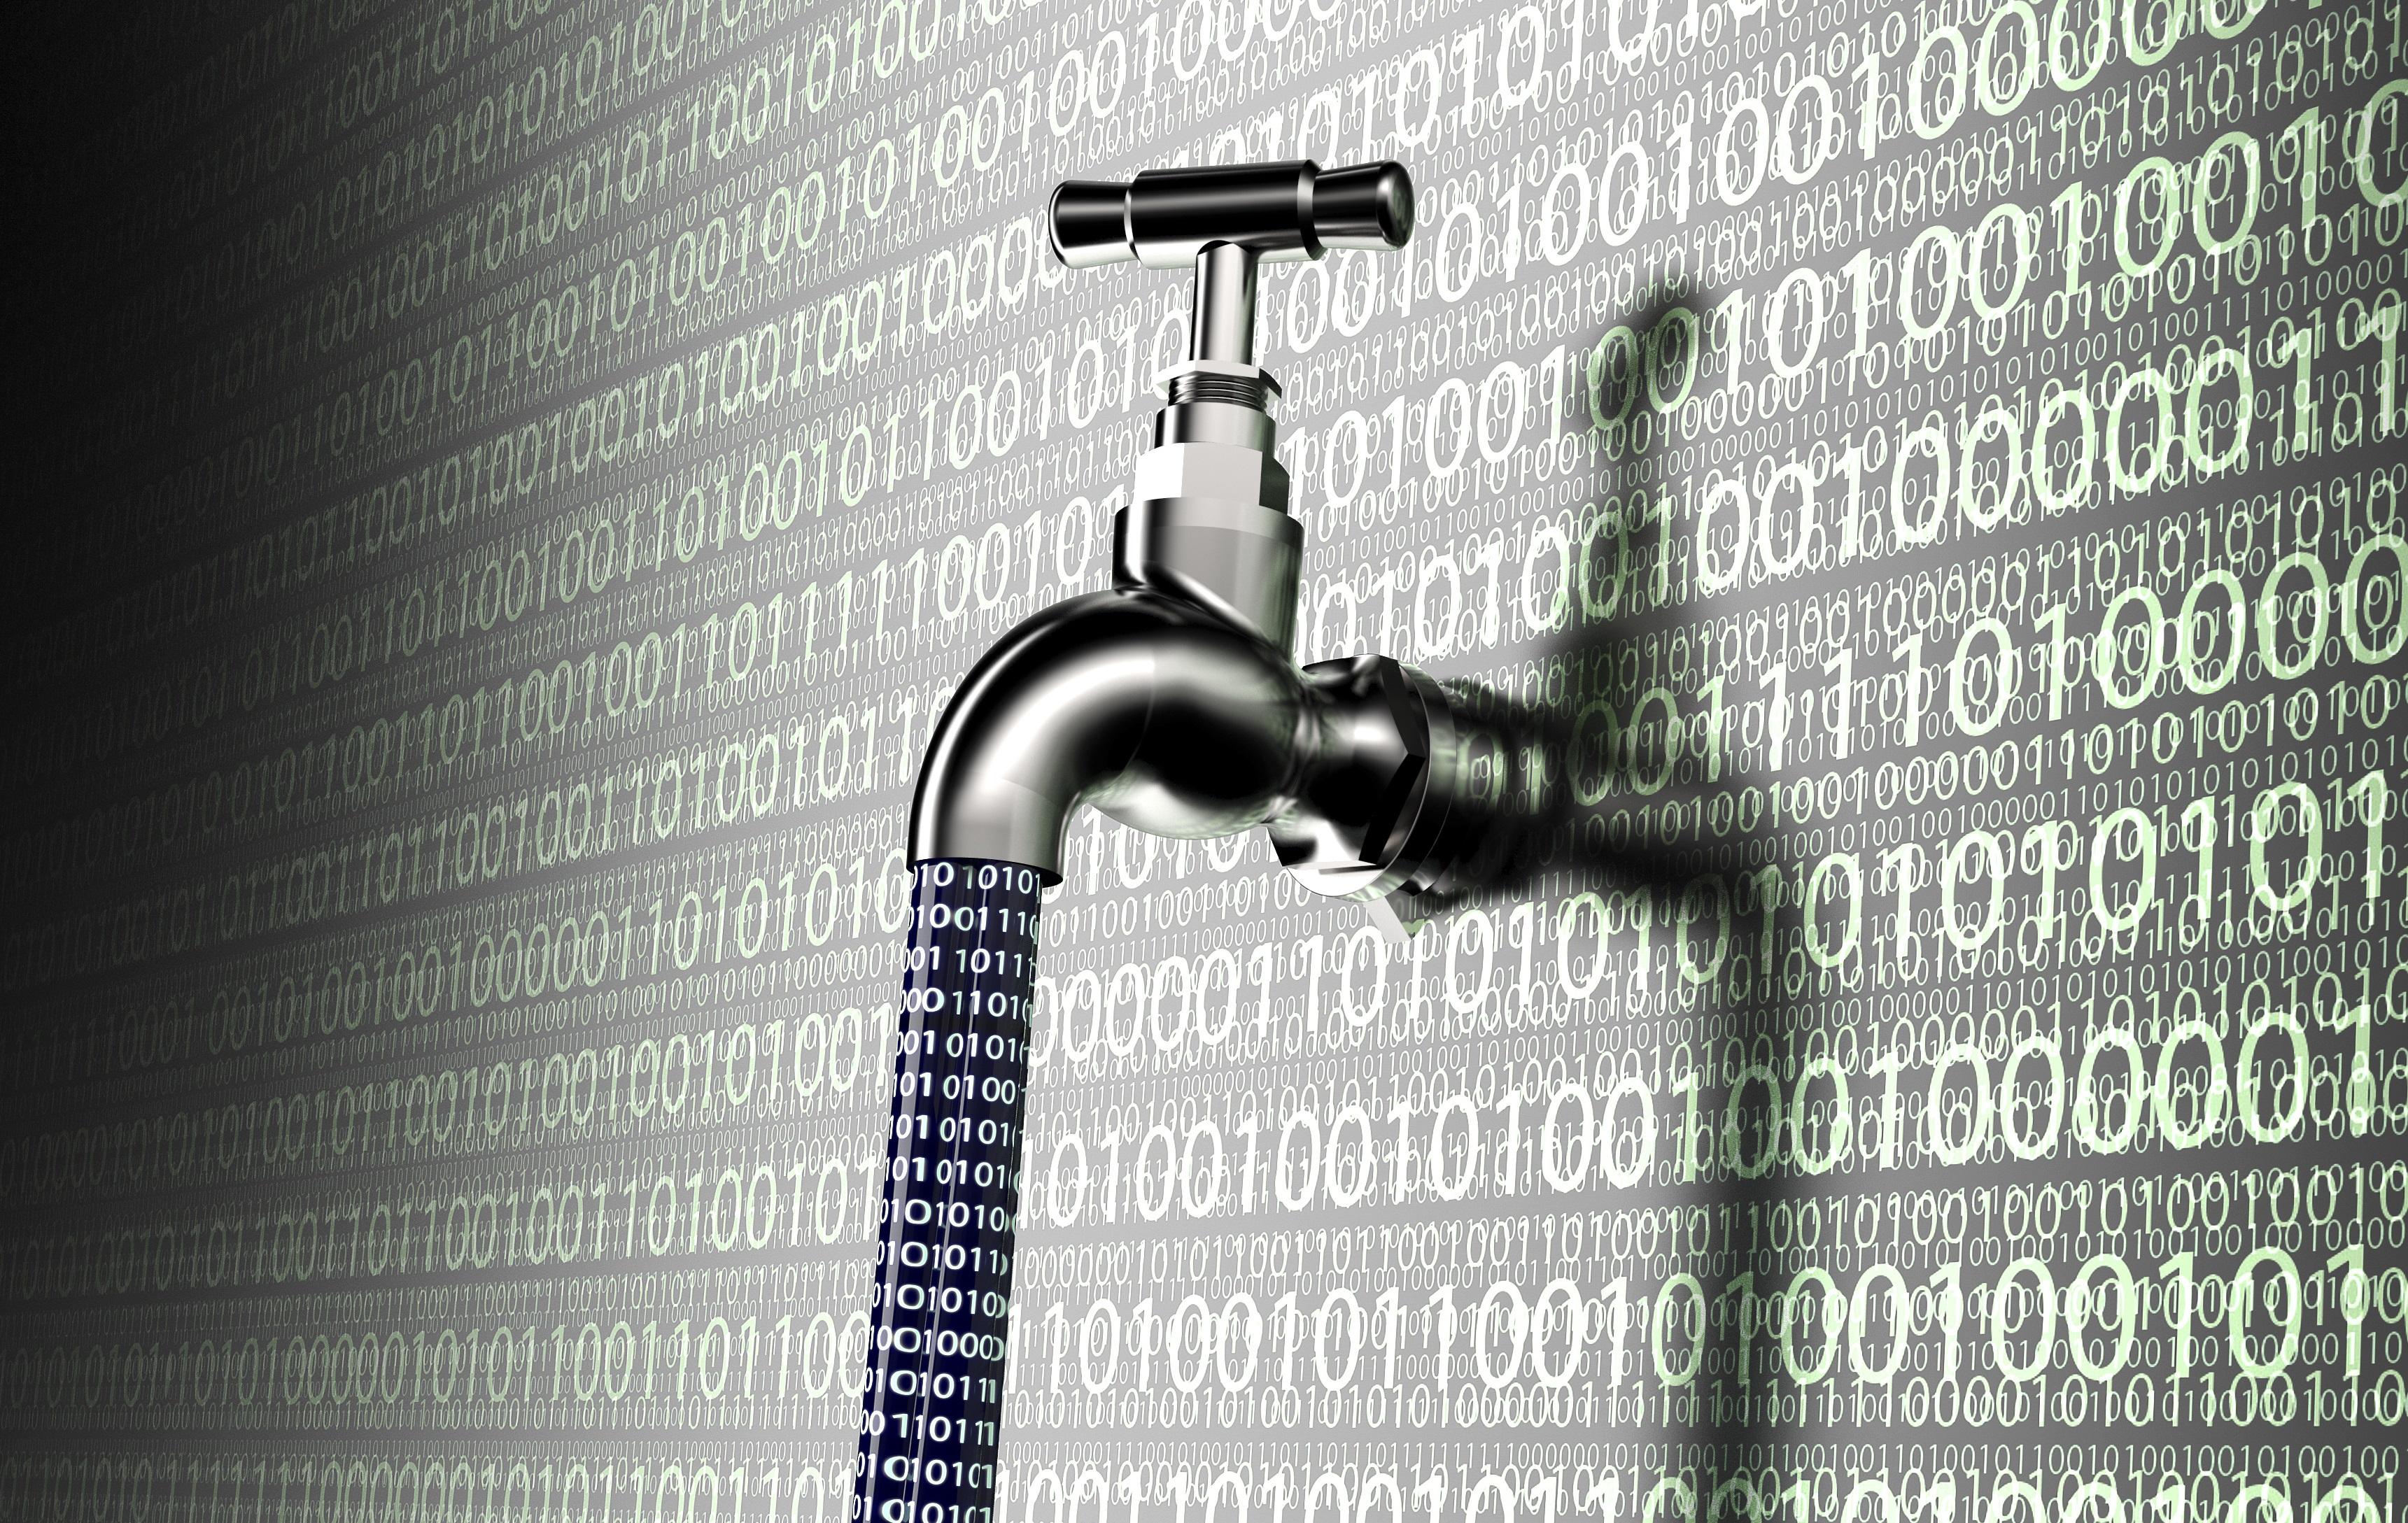 Leaky_server_aws_data